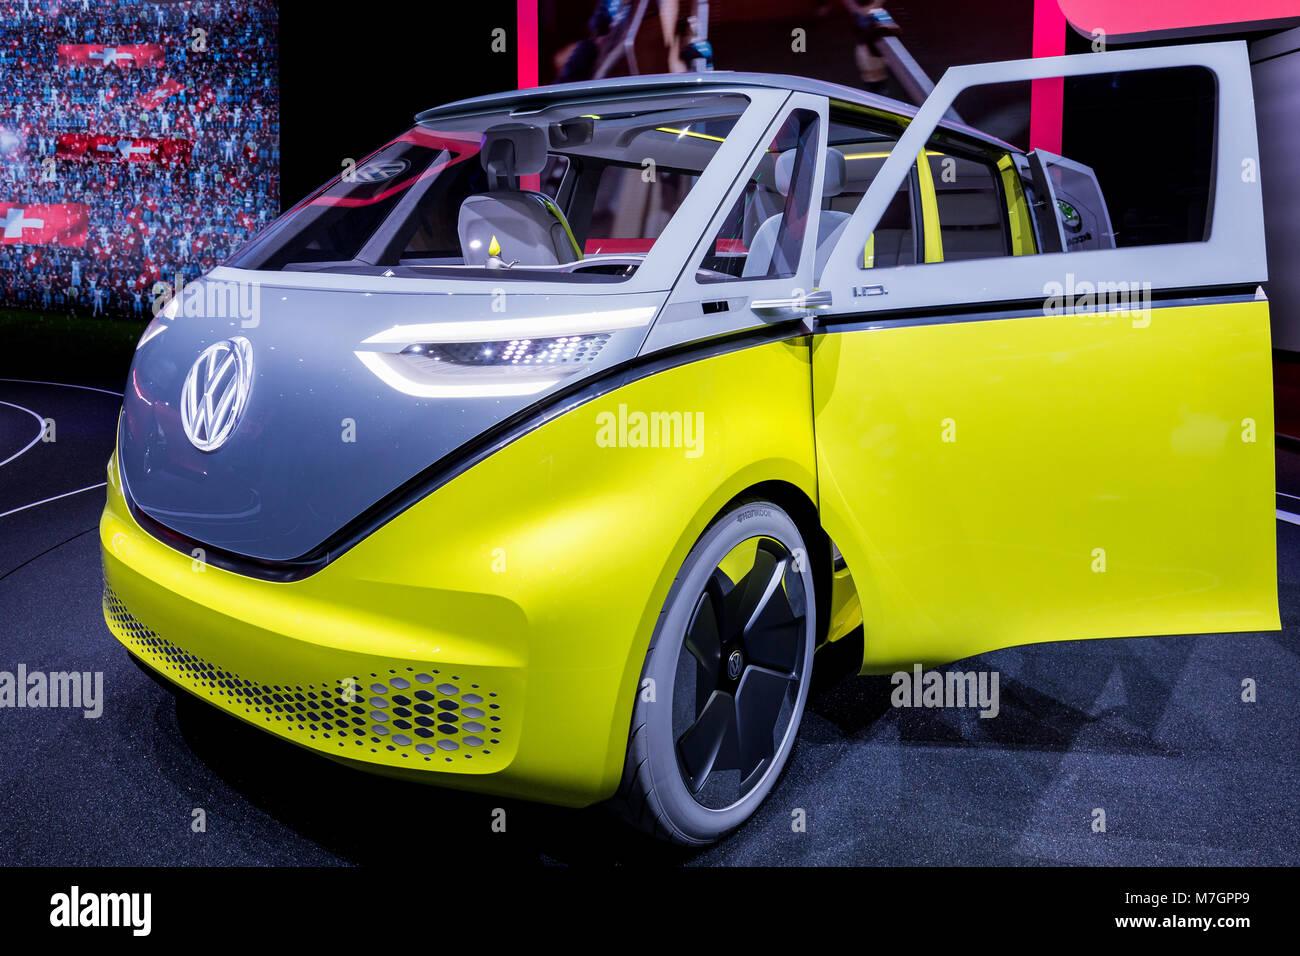 ID Buzz Microbus, Volkswagen, VW Camper, Electric minibus, Geneva Motor show, Switzerland - Stock Image